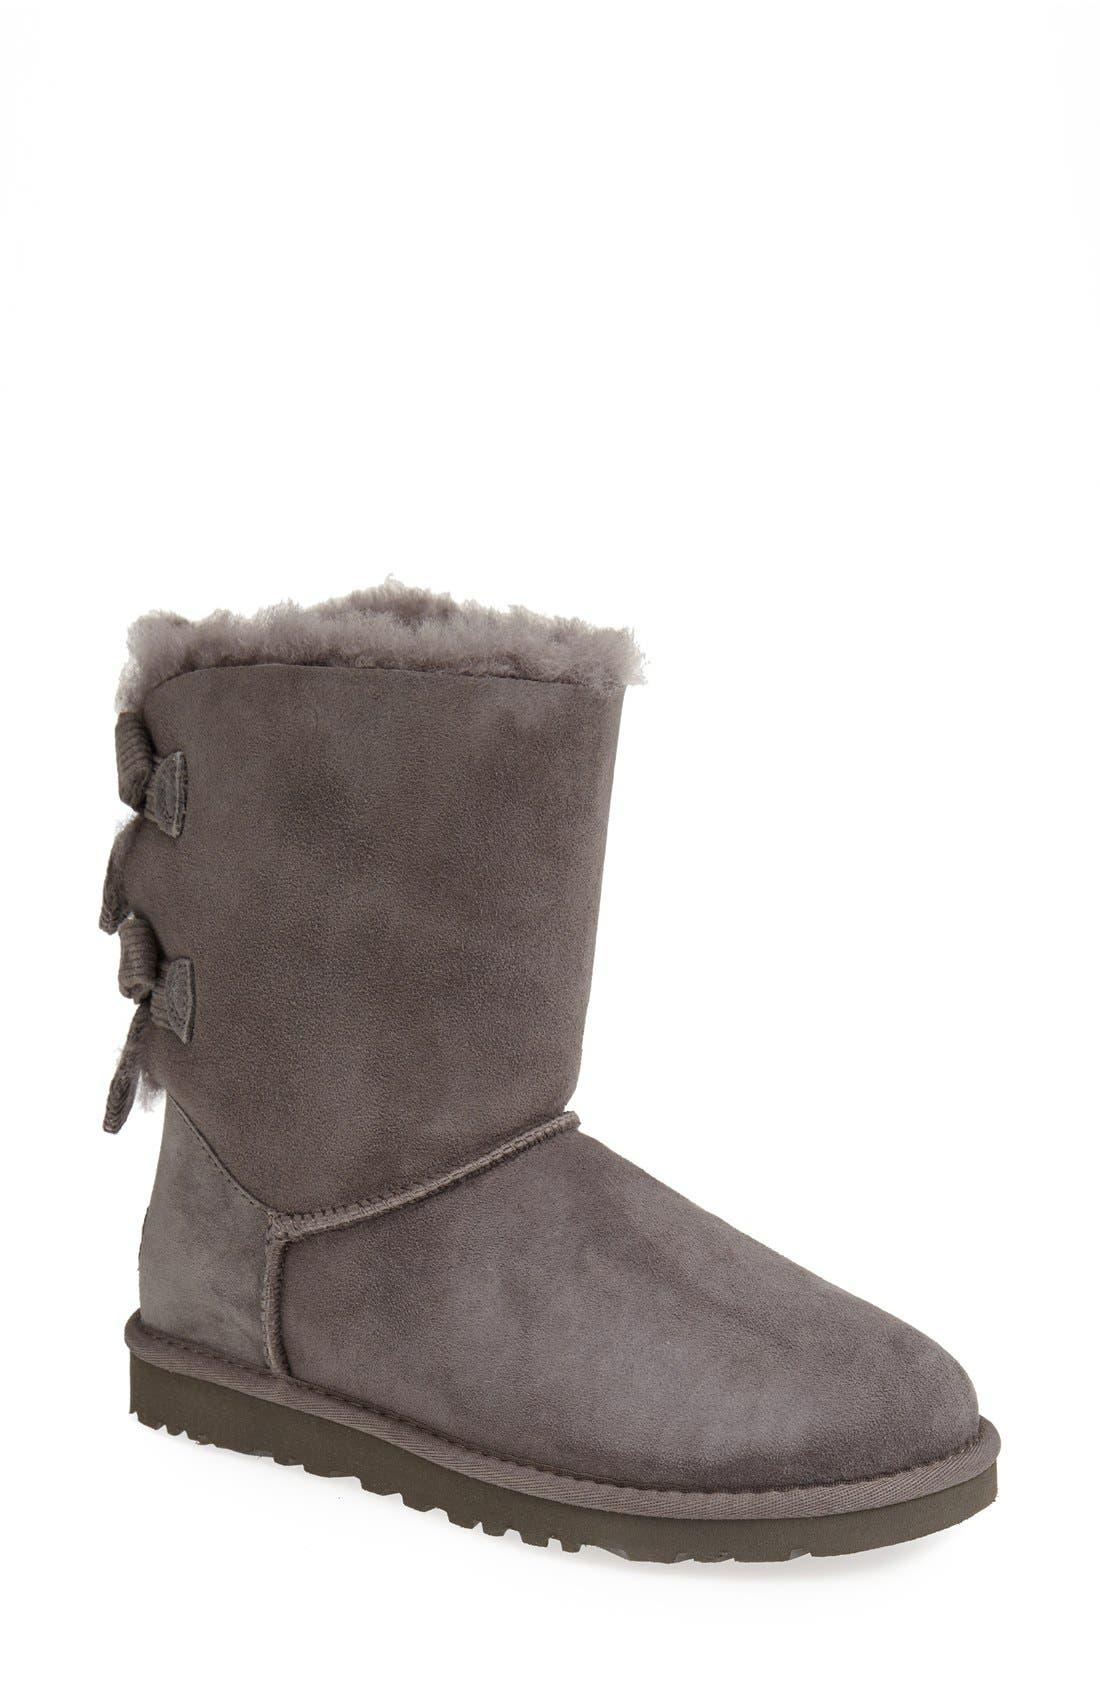 Australia 'Bailey Bow Corduroy' Boot, Main, color, 020